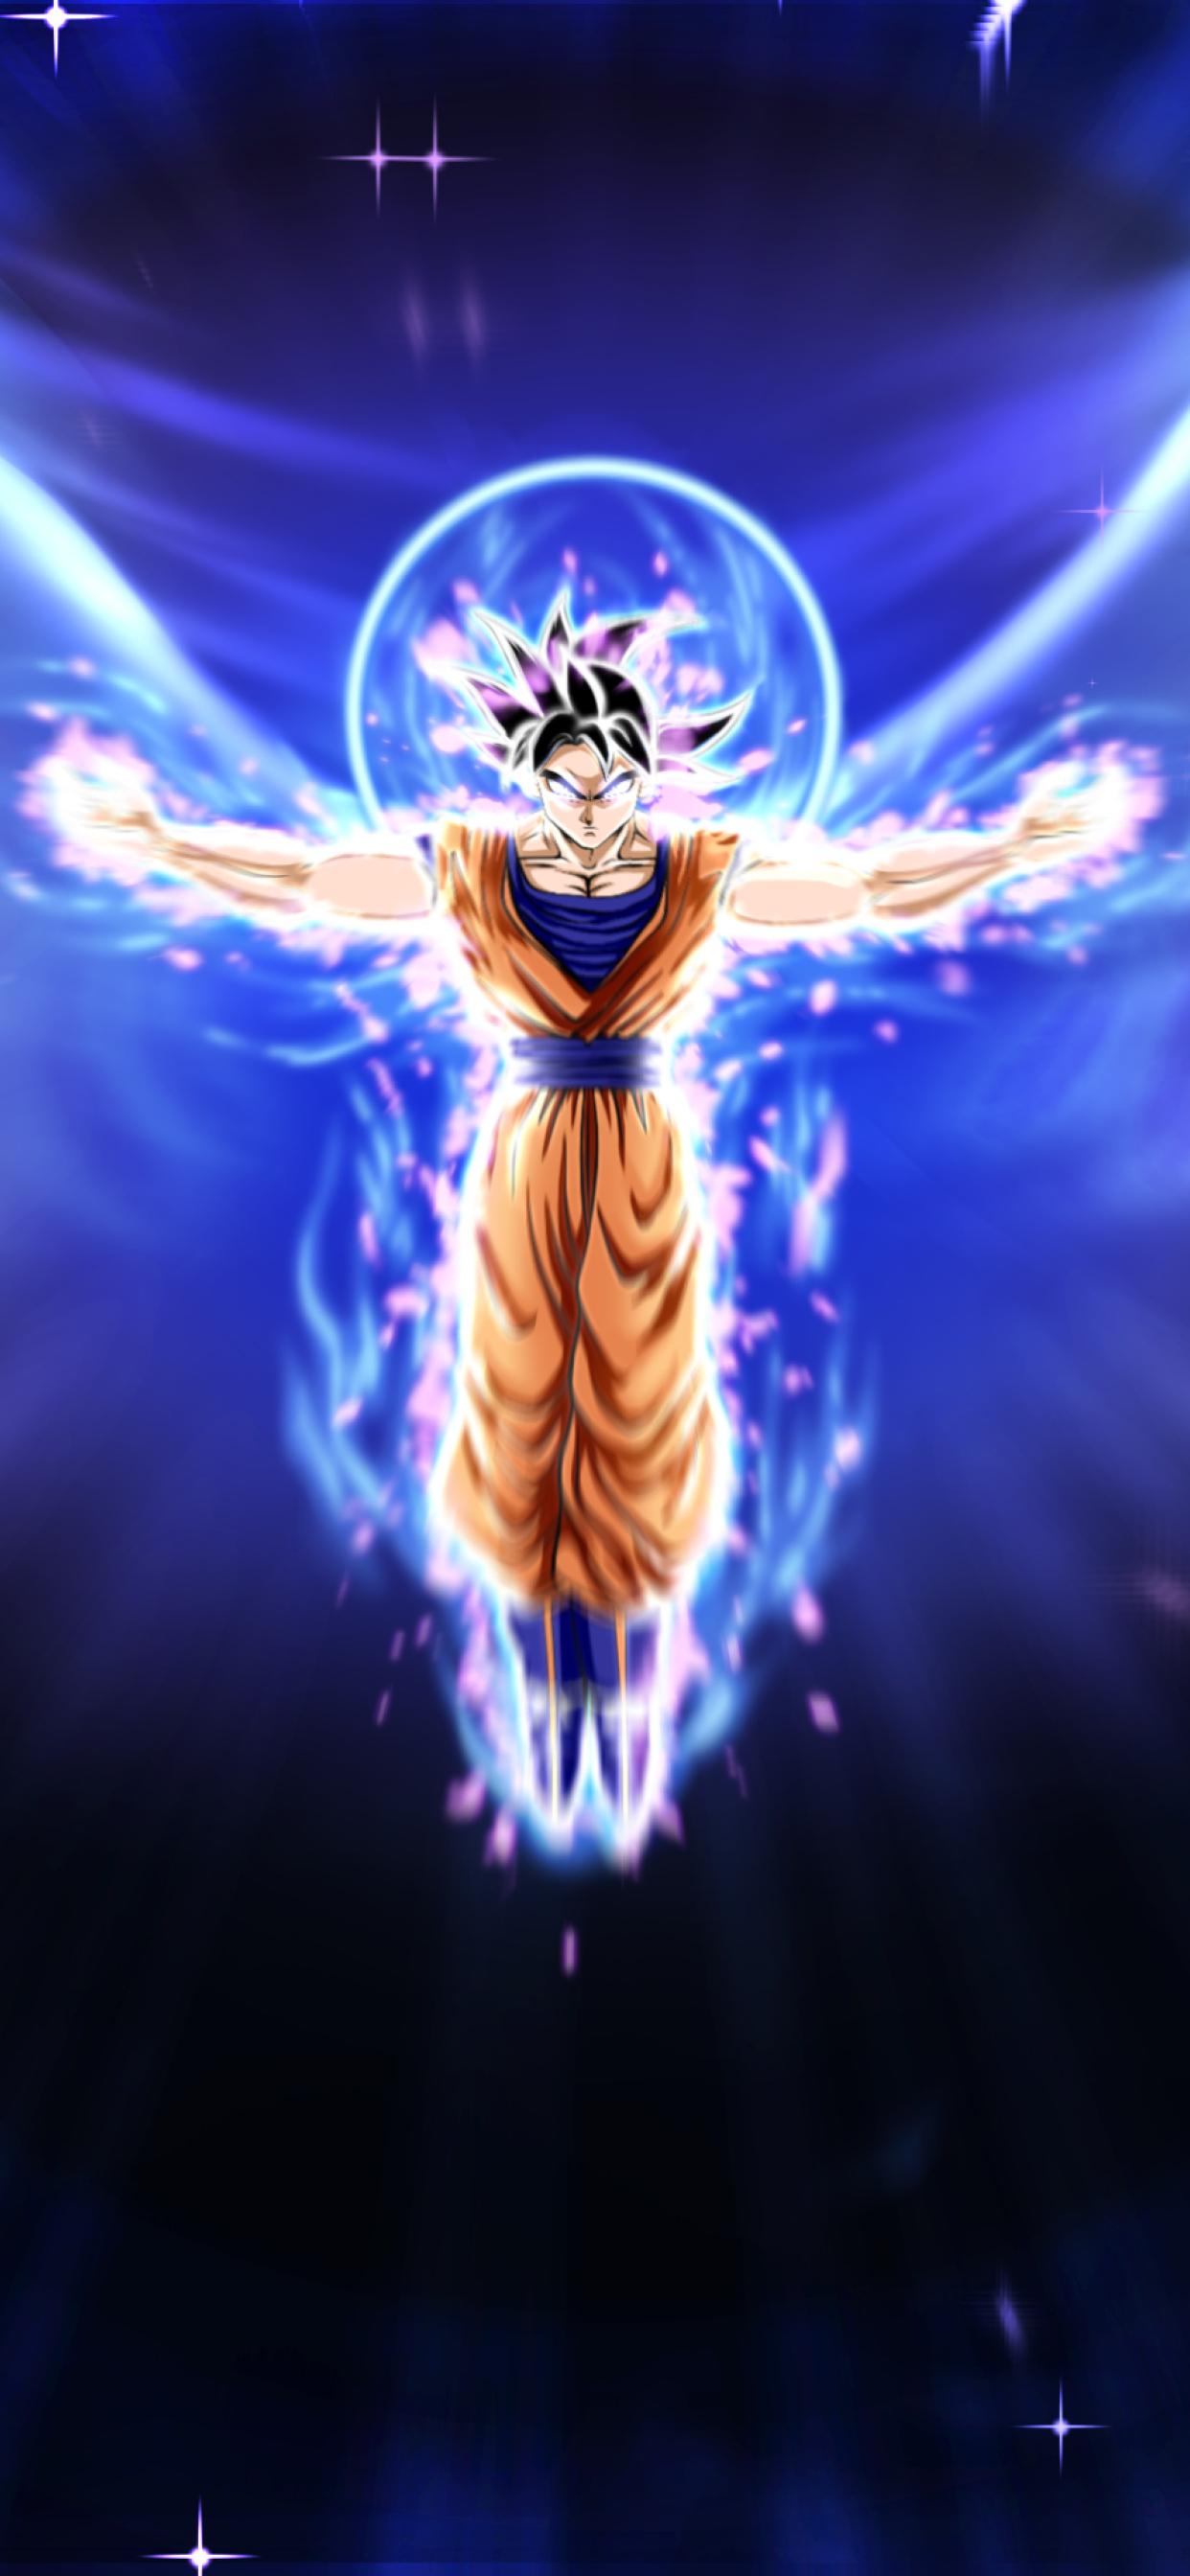 Full Hd Goku Wallpaper Iphone Gambarku